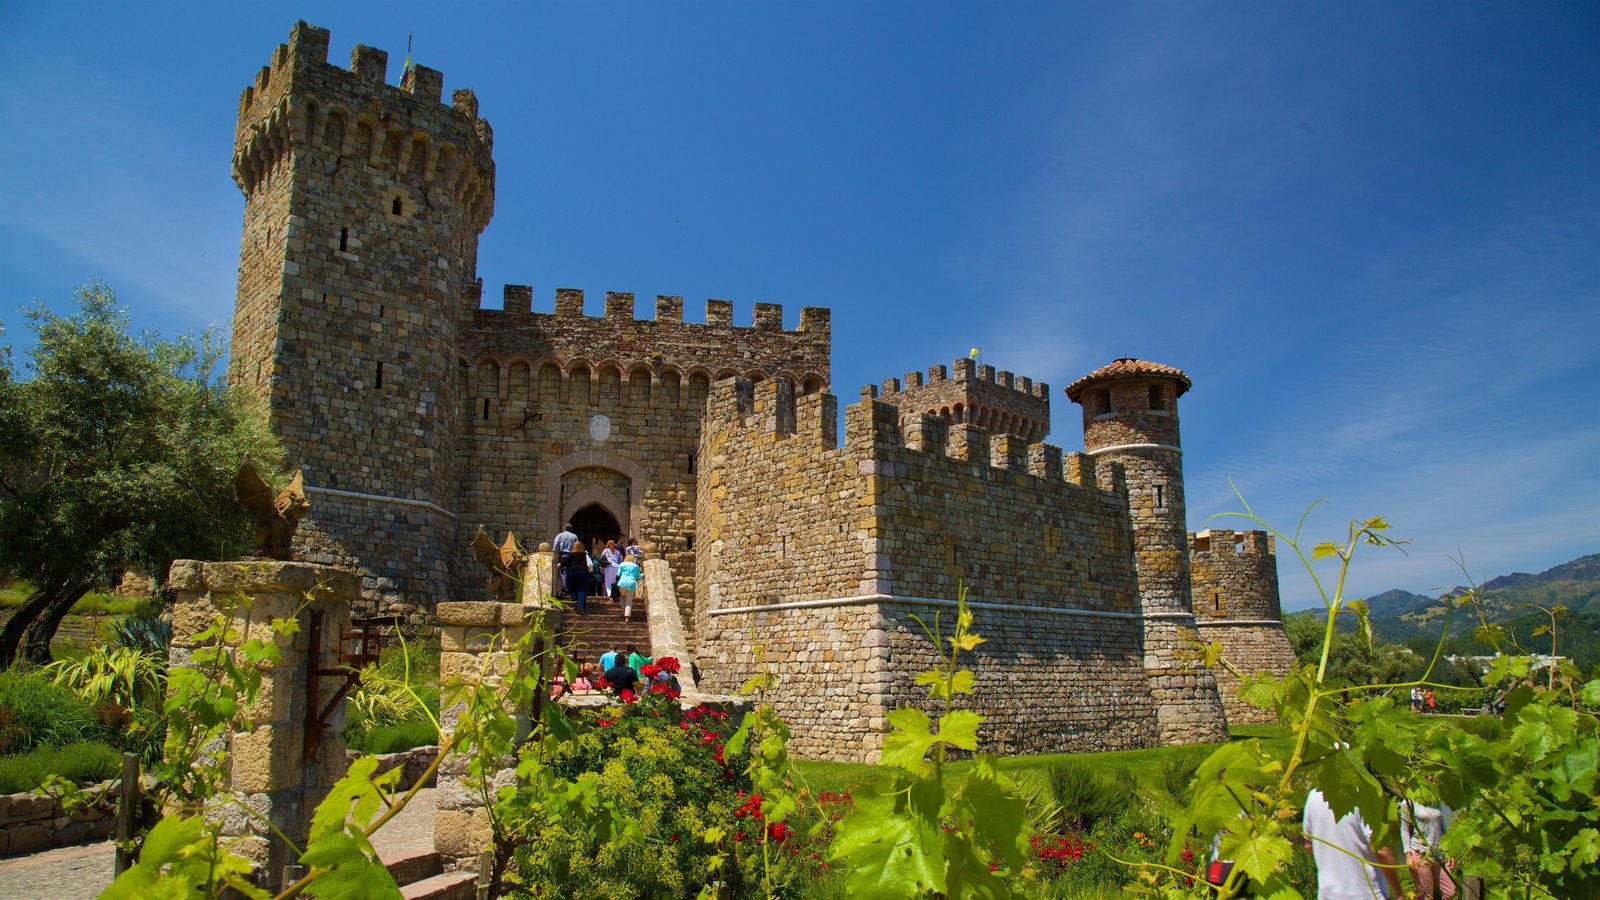 Castello di Amorosa mostrando una iglesia o catedral, flores silvestres y elementos del patrimonio